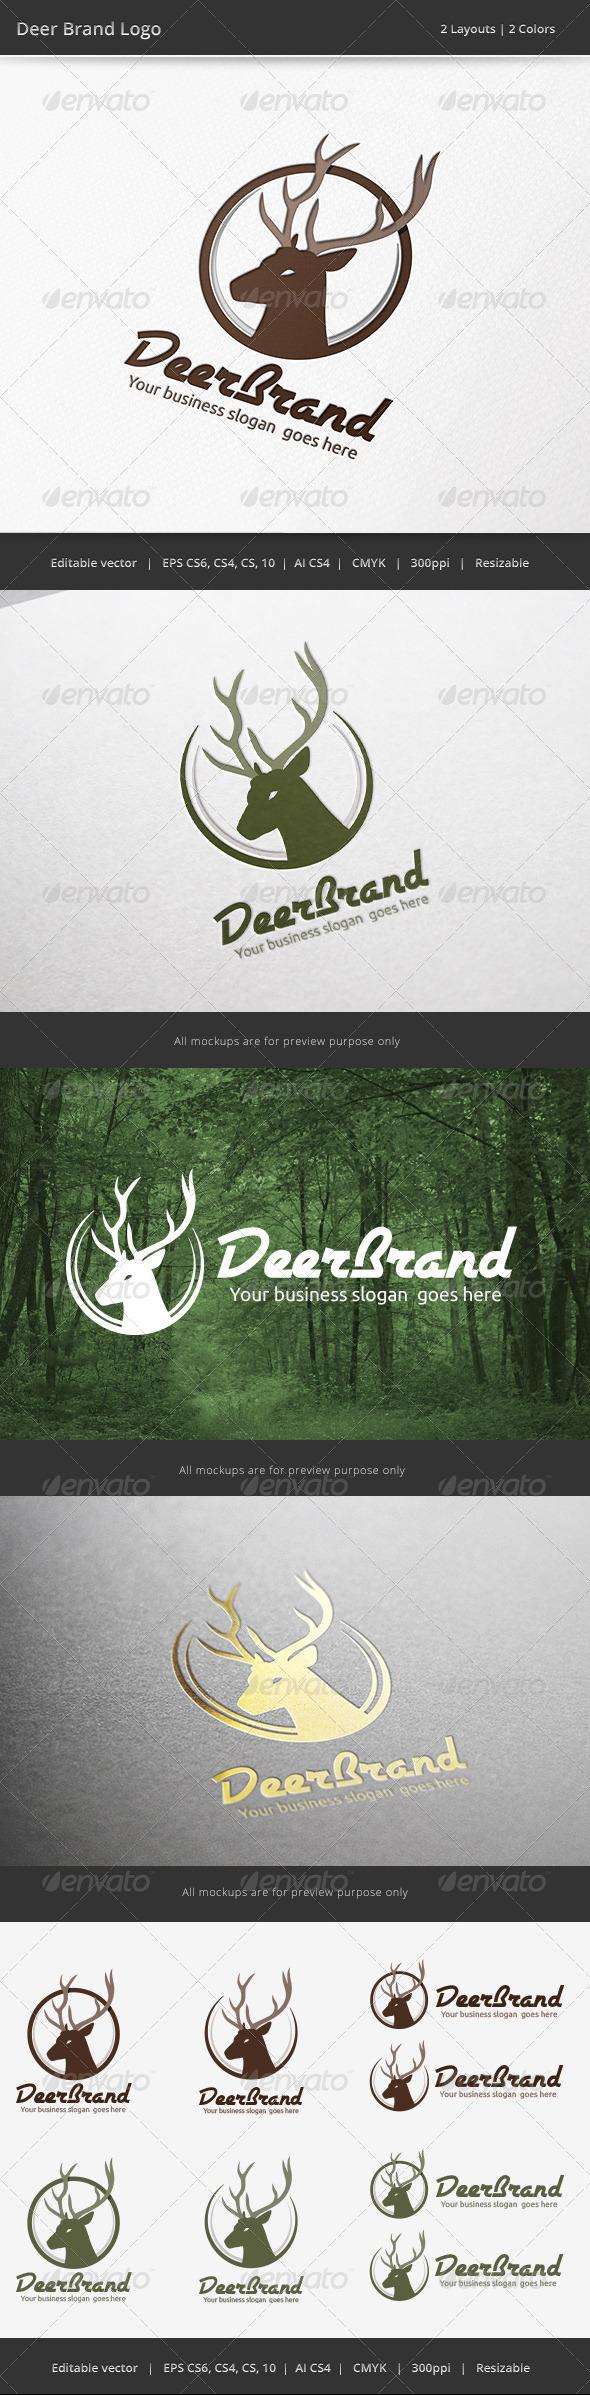 Deer Brand Logo - Animals Logo Templates